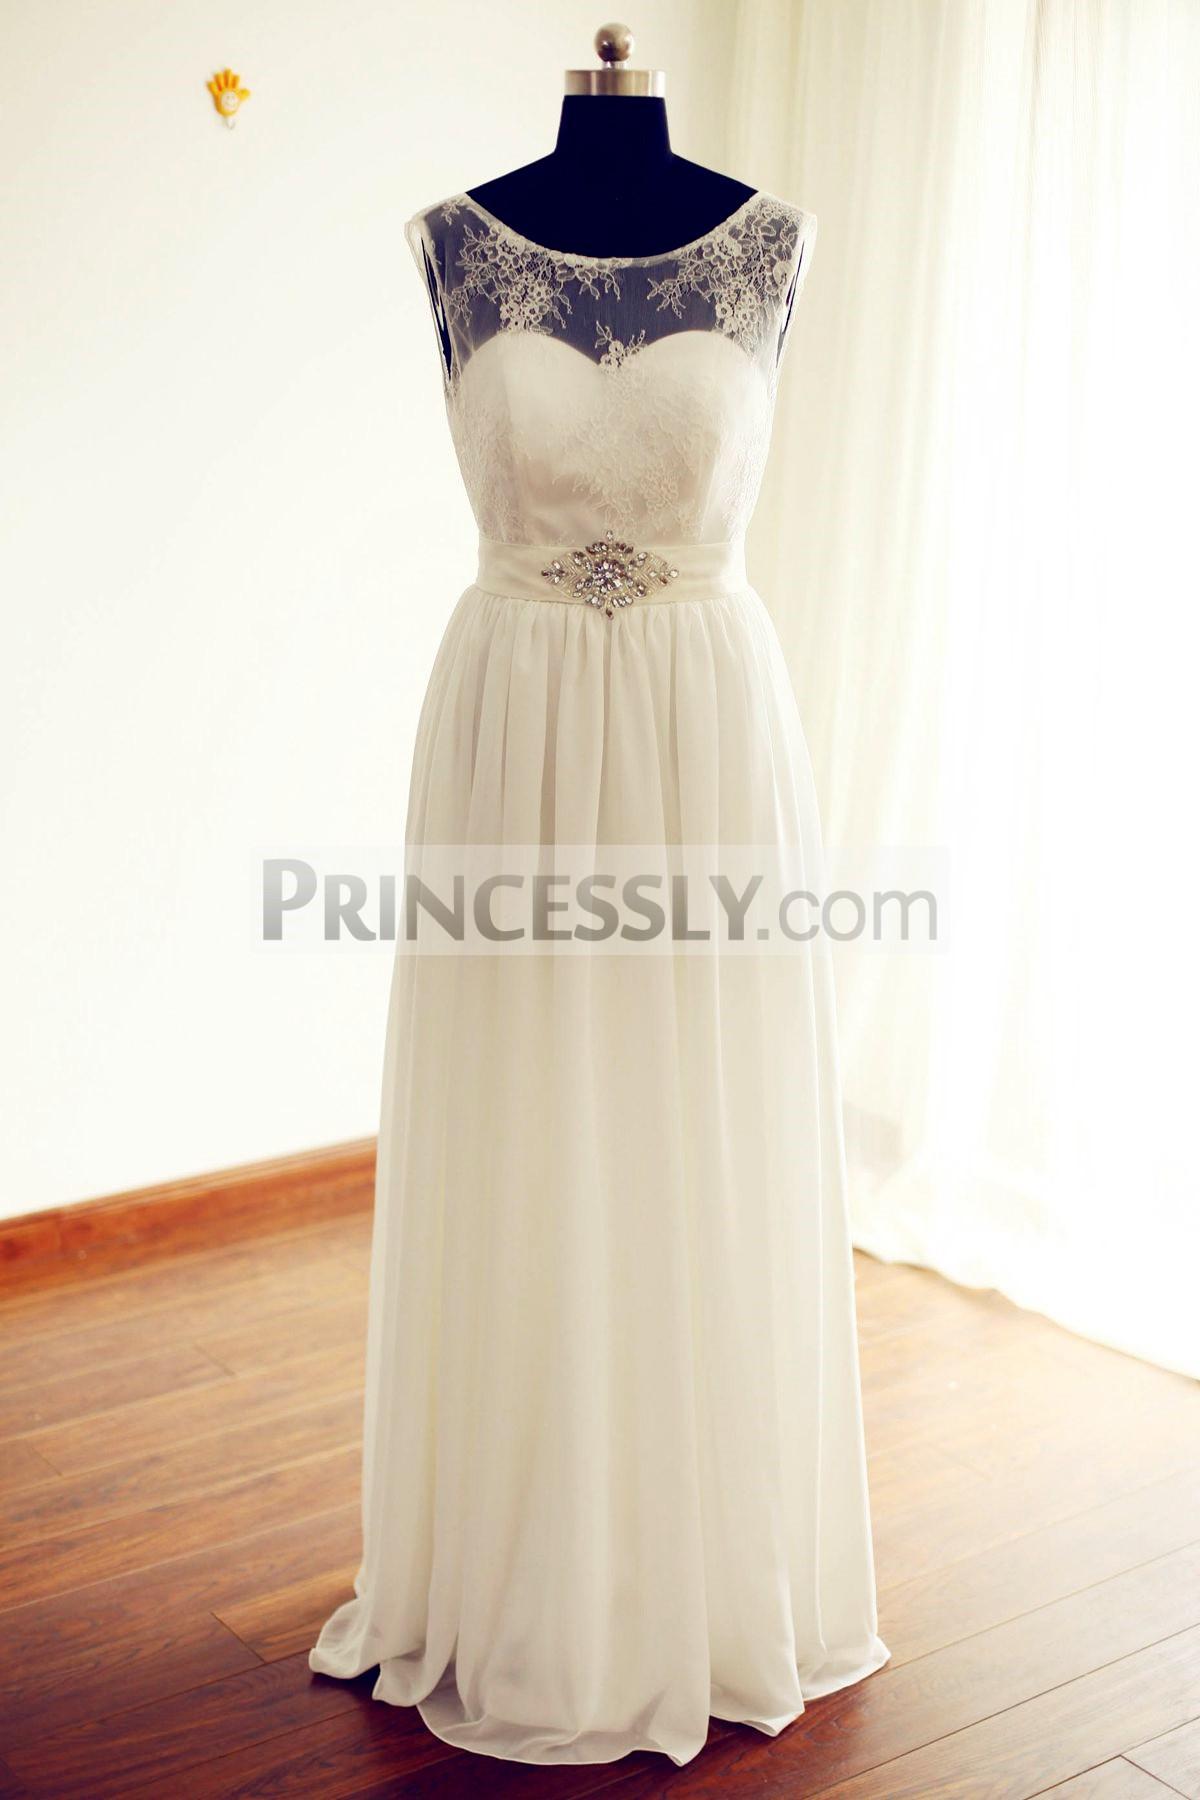 Princessly.com-K1000226-Sheer See Through Ivory Lace Chiffon V Back Wedding Dress-31